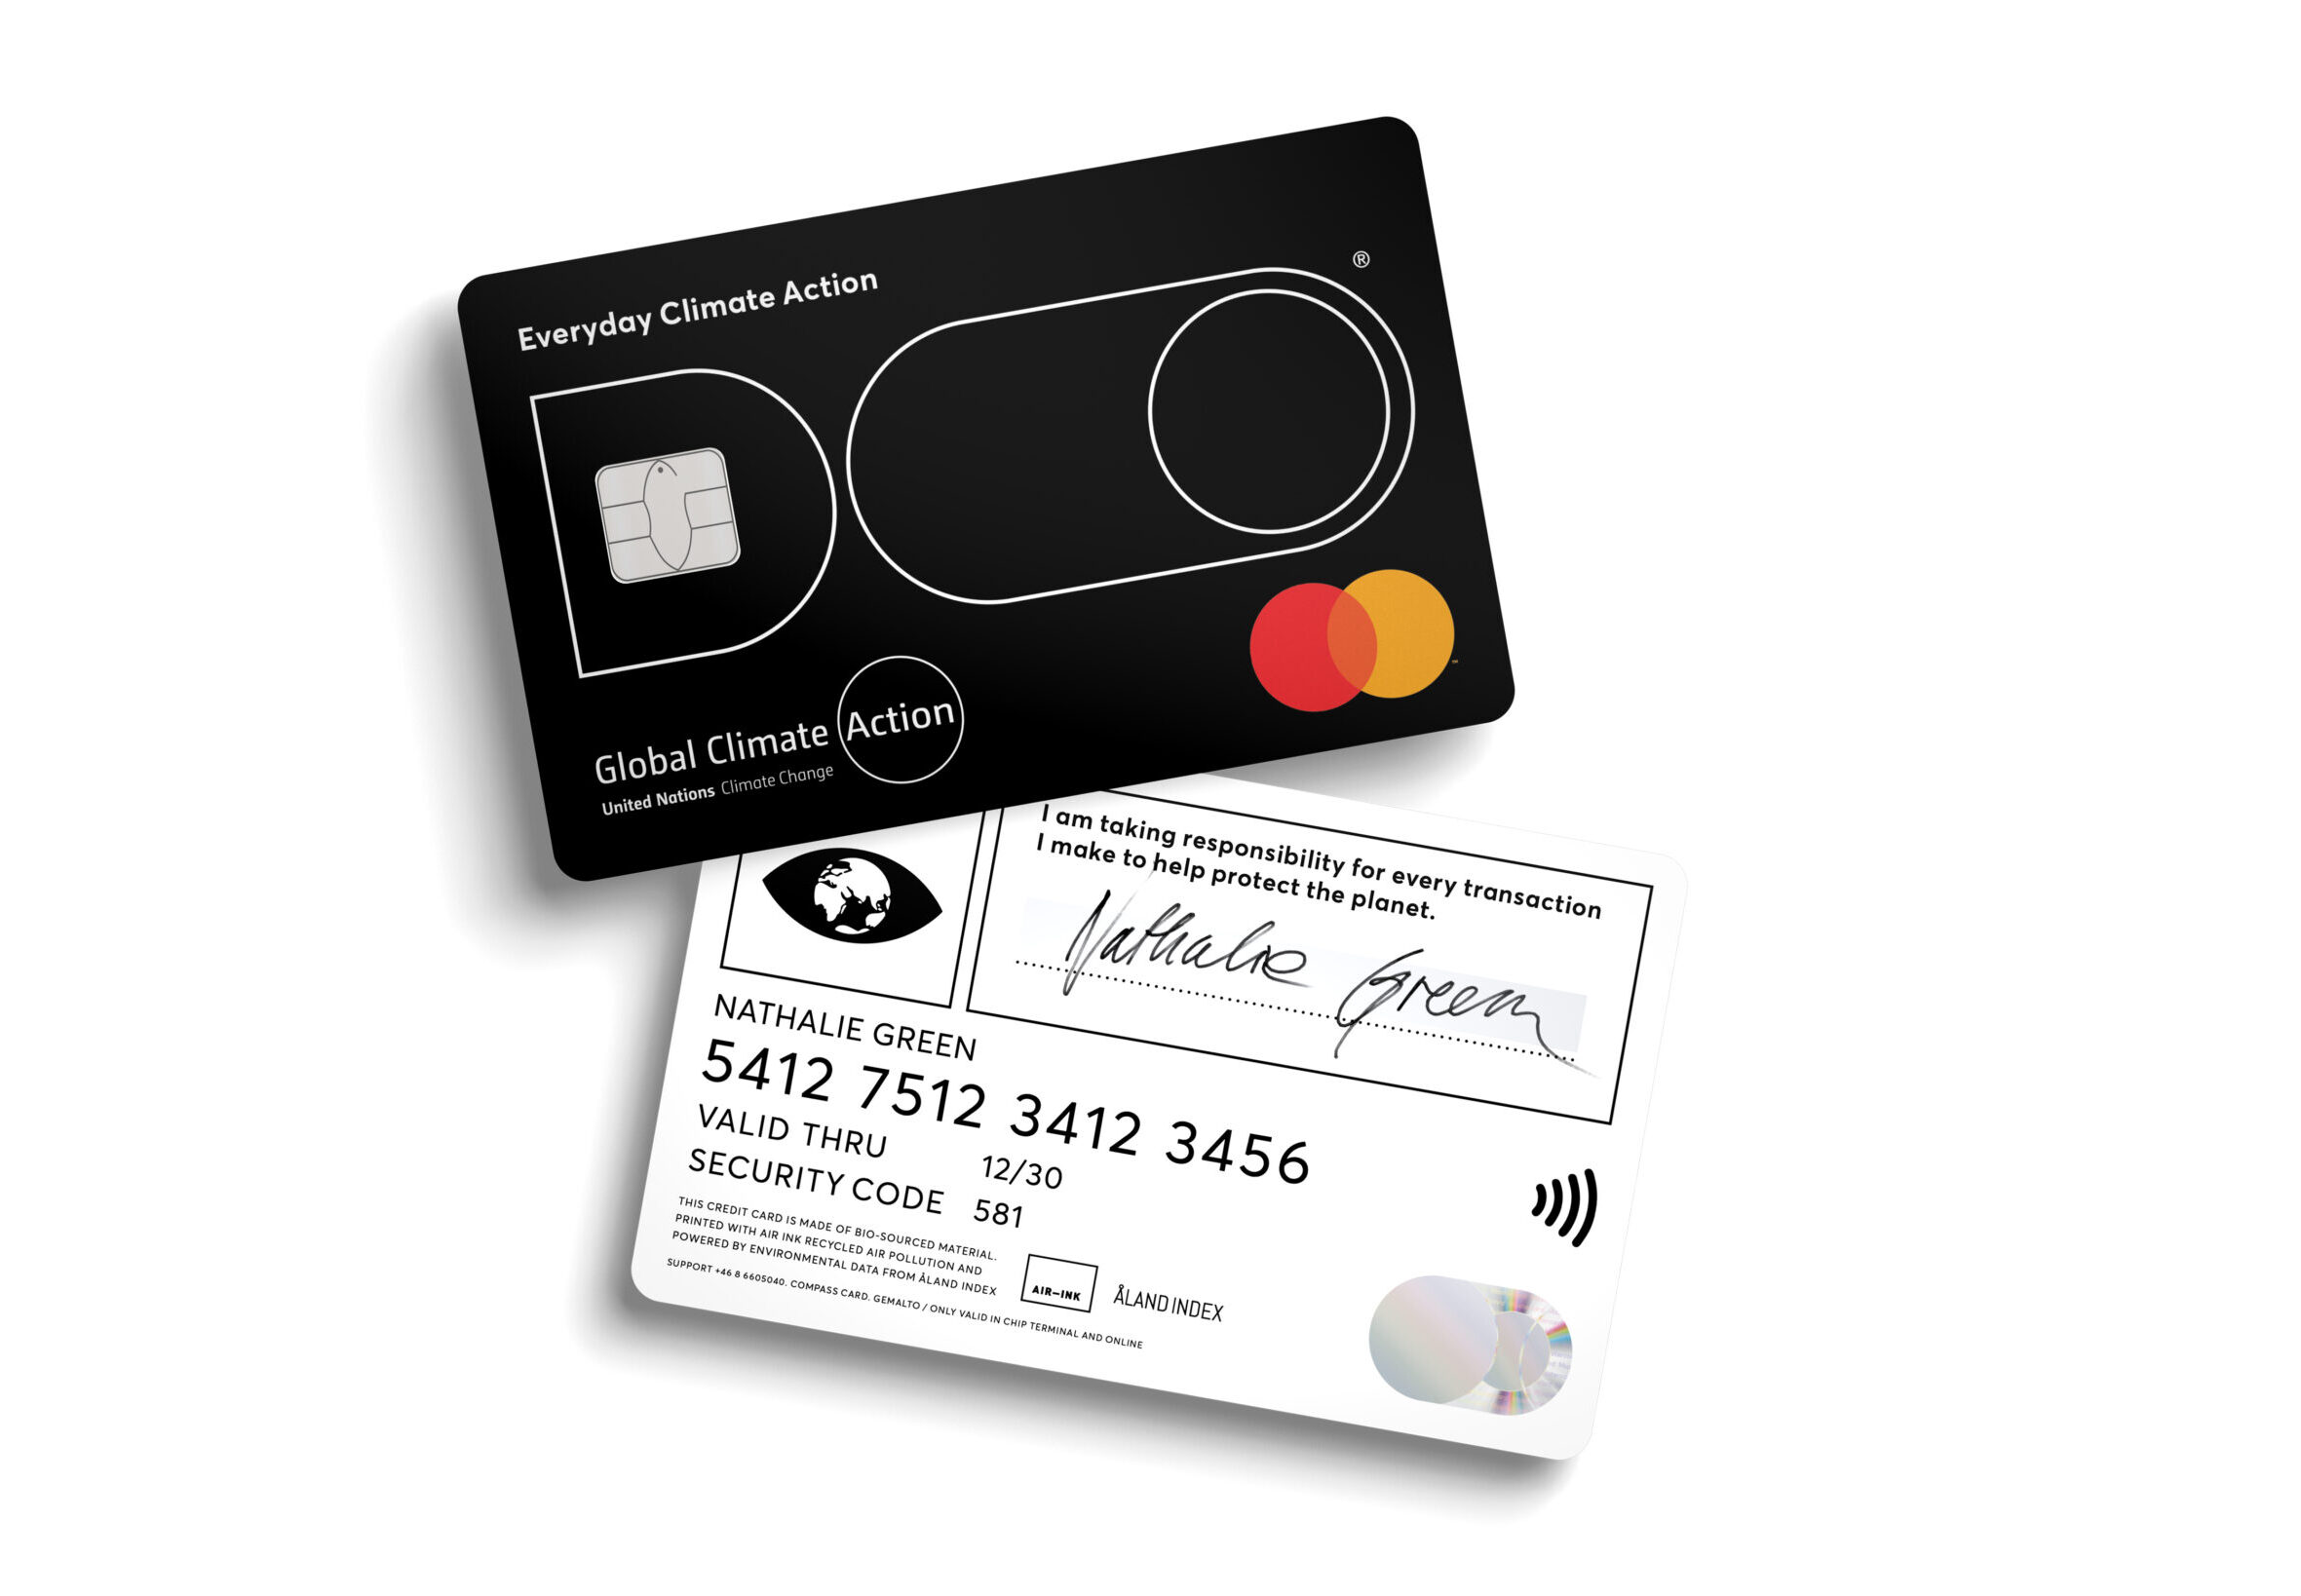 Doconomy Do Black credit card